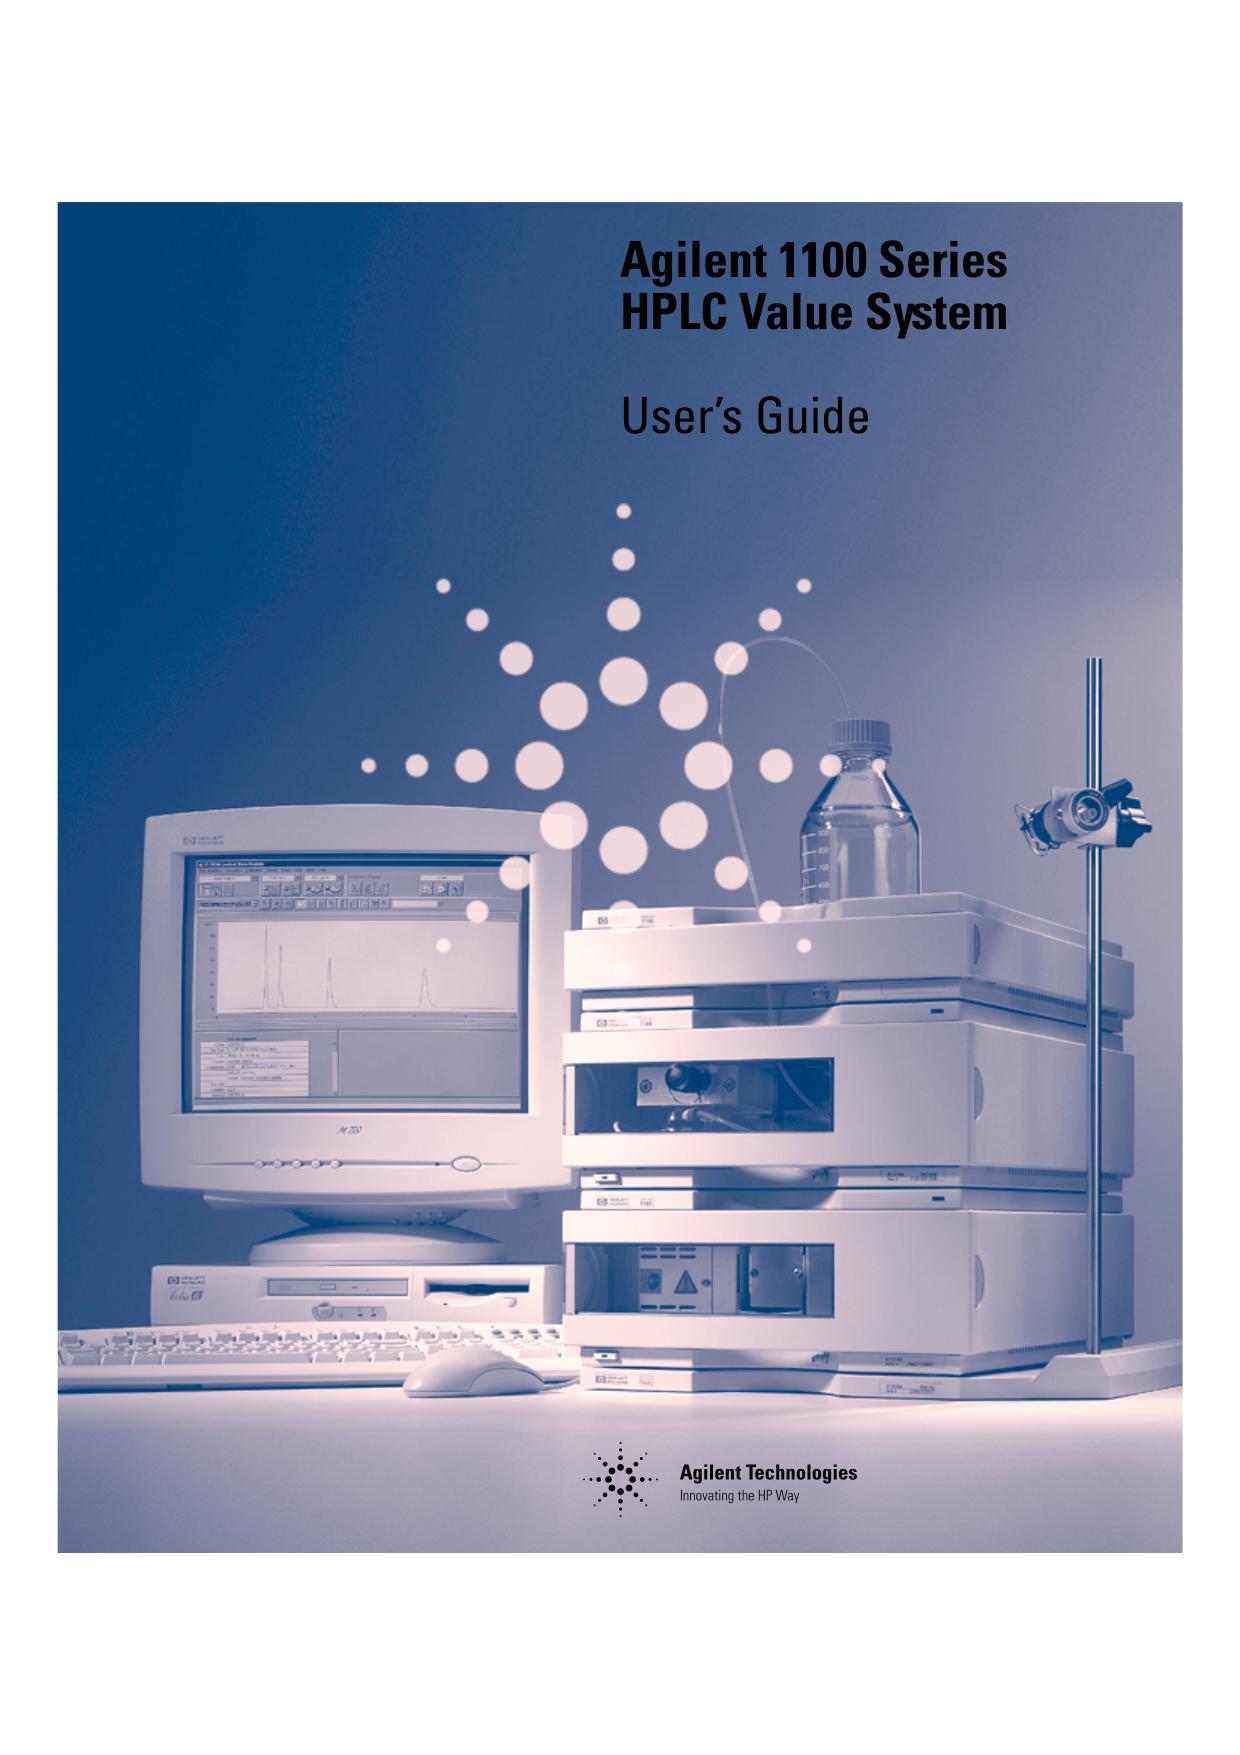 Agilent 1100 Series HPLC Value System User`s Guide | manualzz com